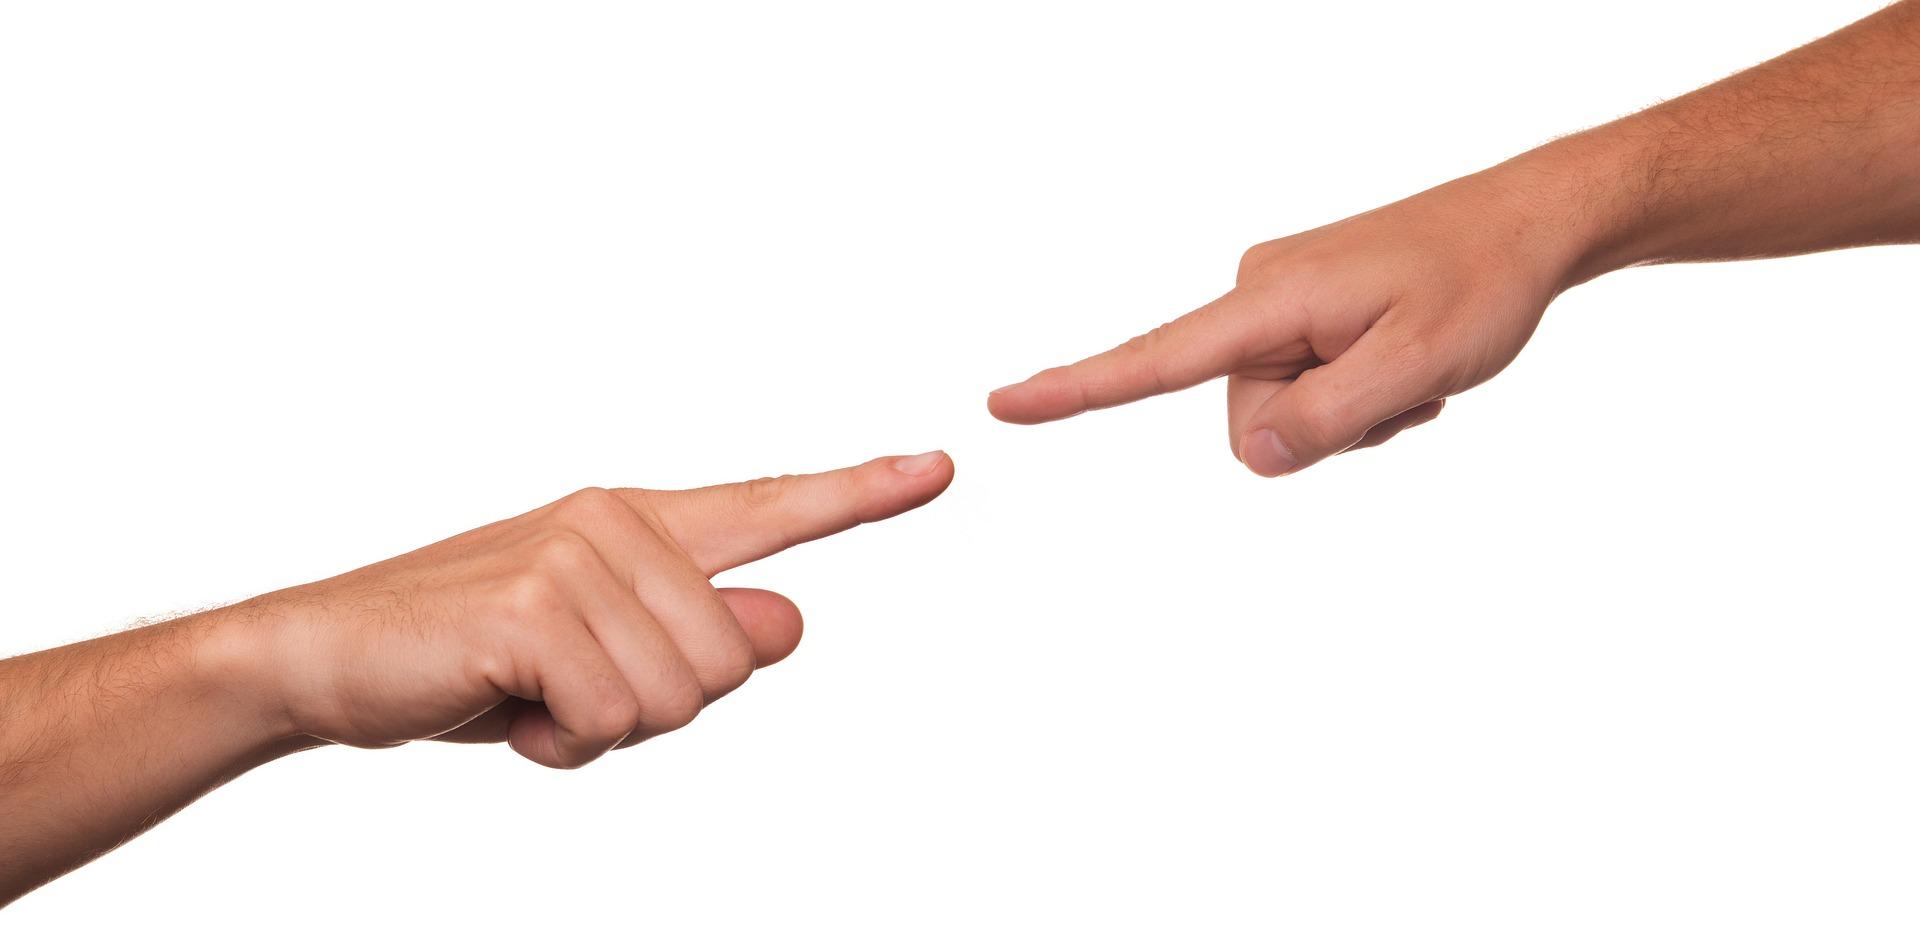 pointing-1991215_1920.jpg